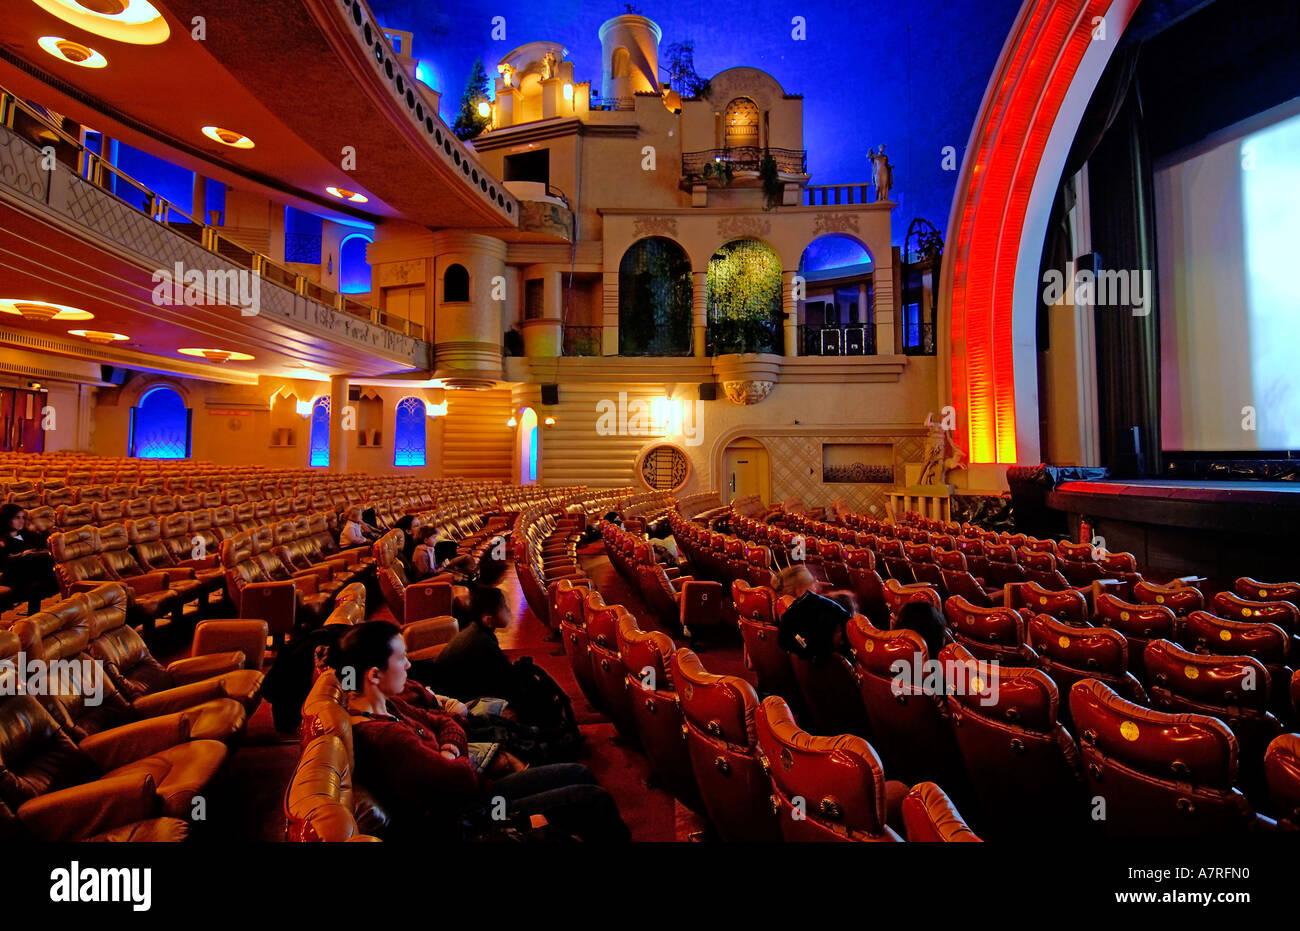 france paris grand rex cinema stock photo 6800015 alamy. Black Bedroom Furniture Sets. Home Design Ideas